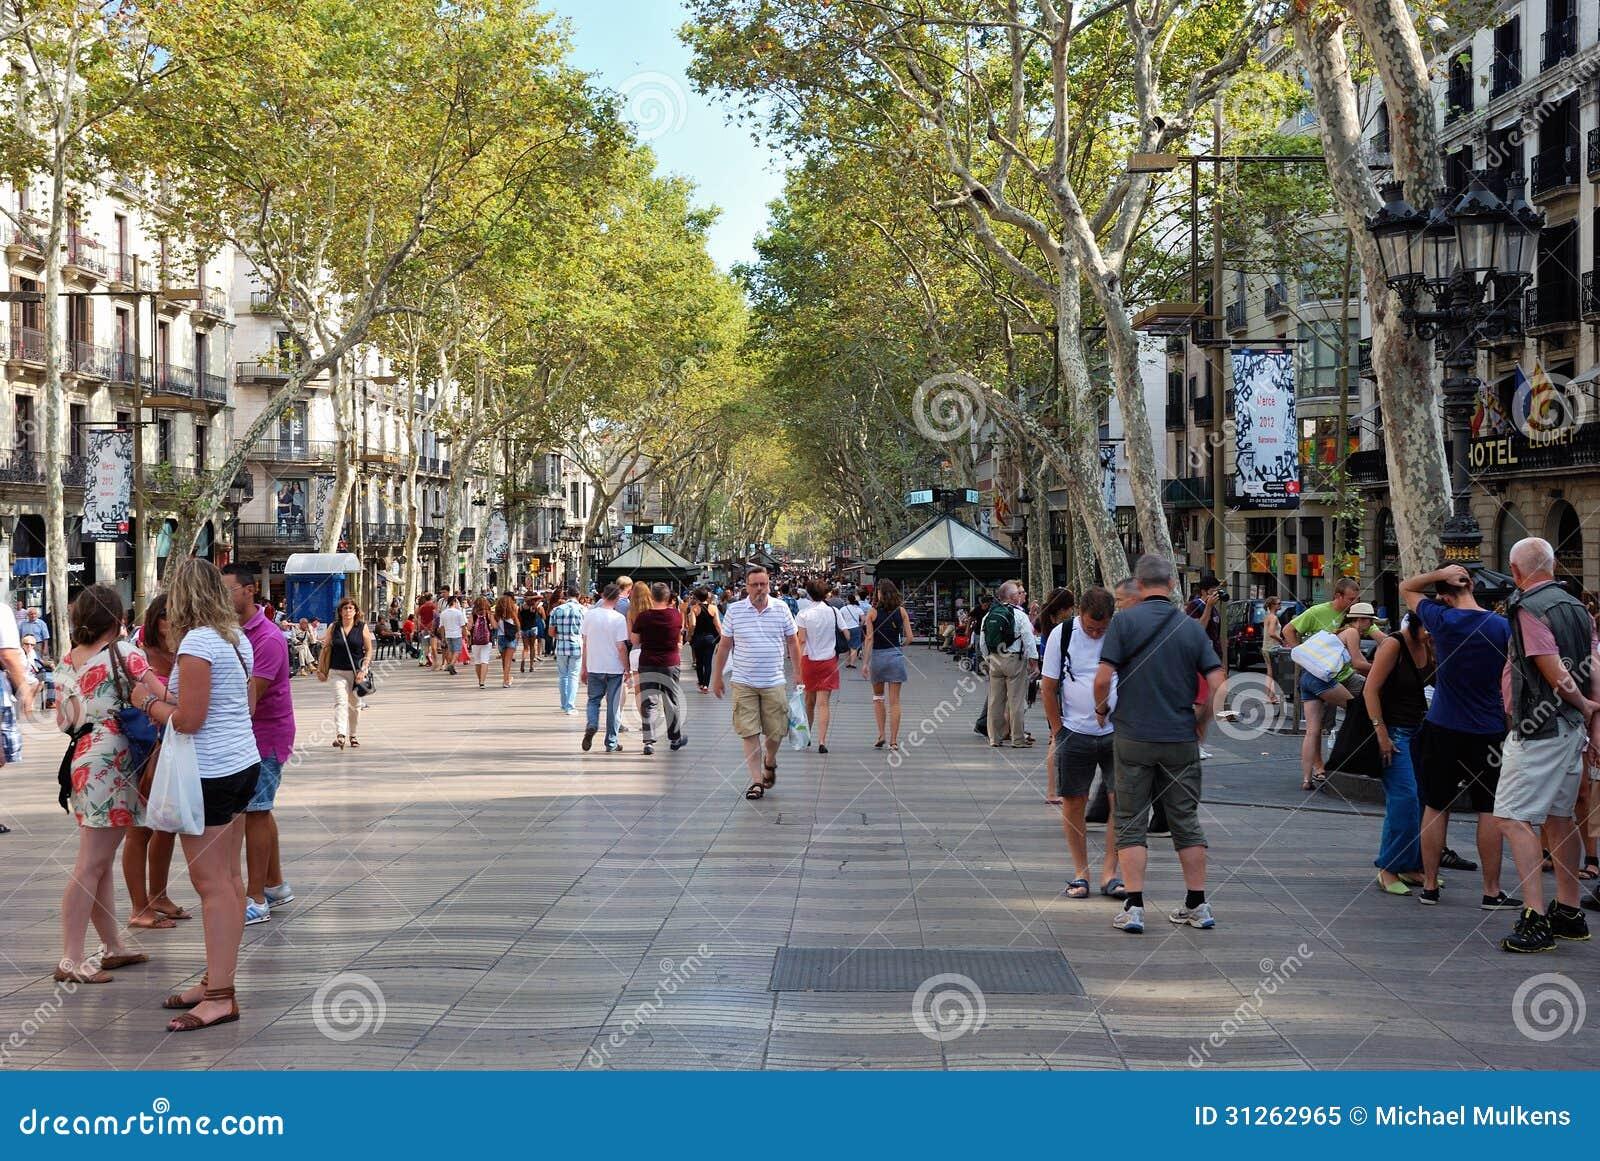 La Rambla, Barcelona Editorial Image - Image: 31262965